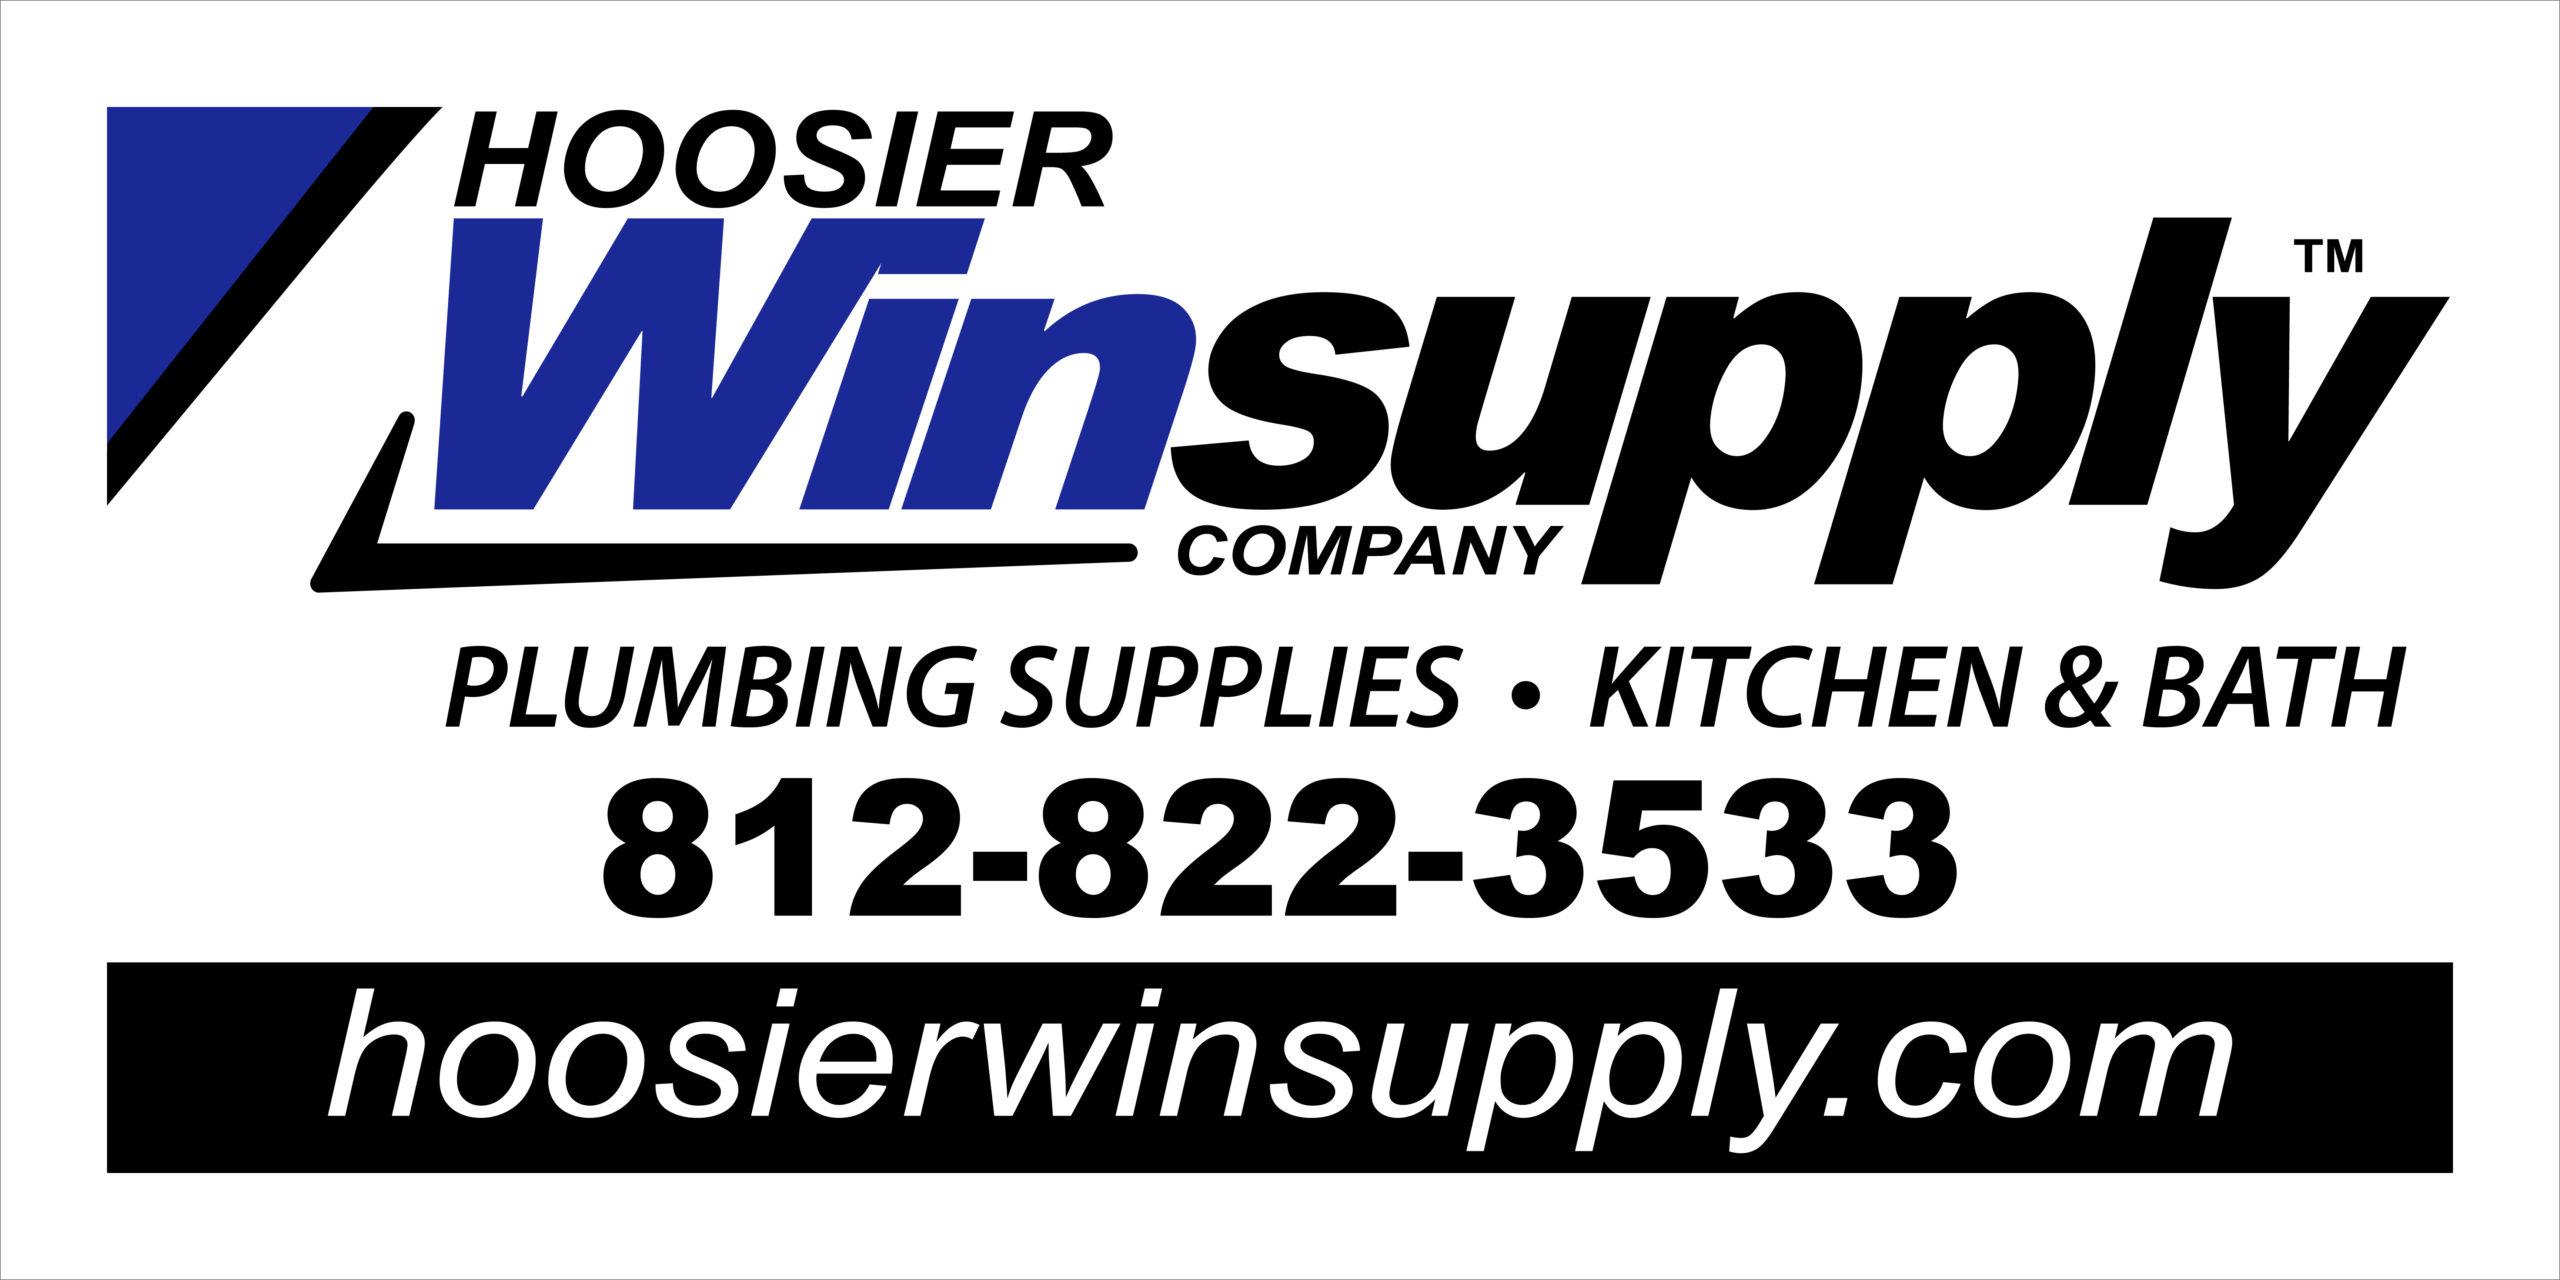 Hoosier WinSupply Company